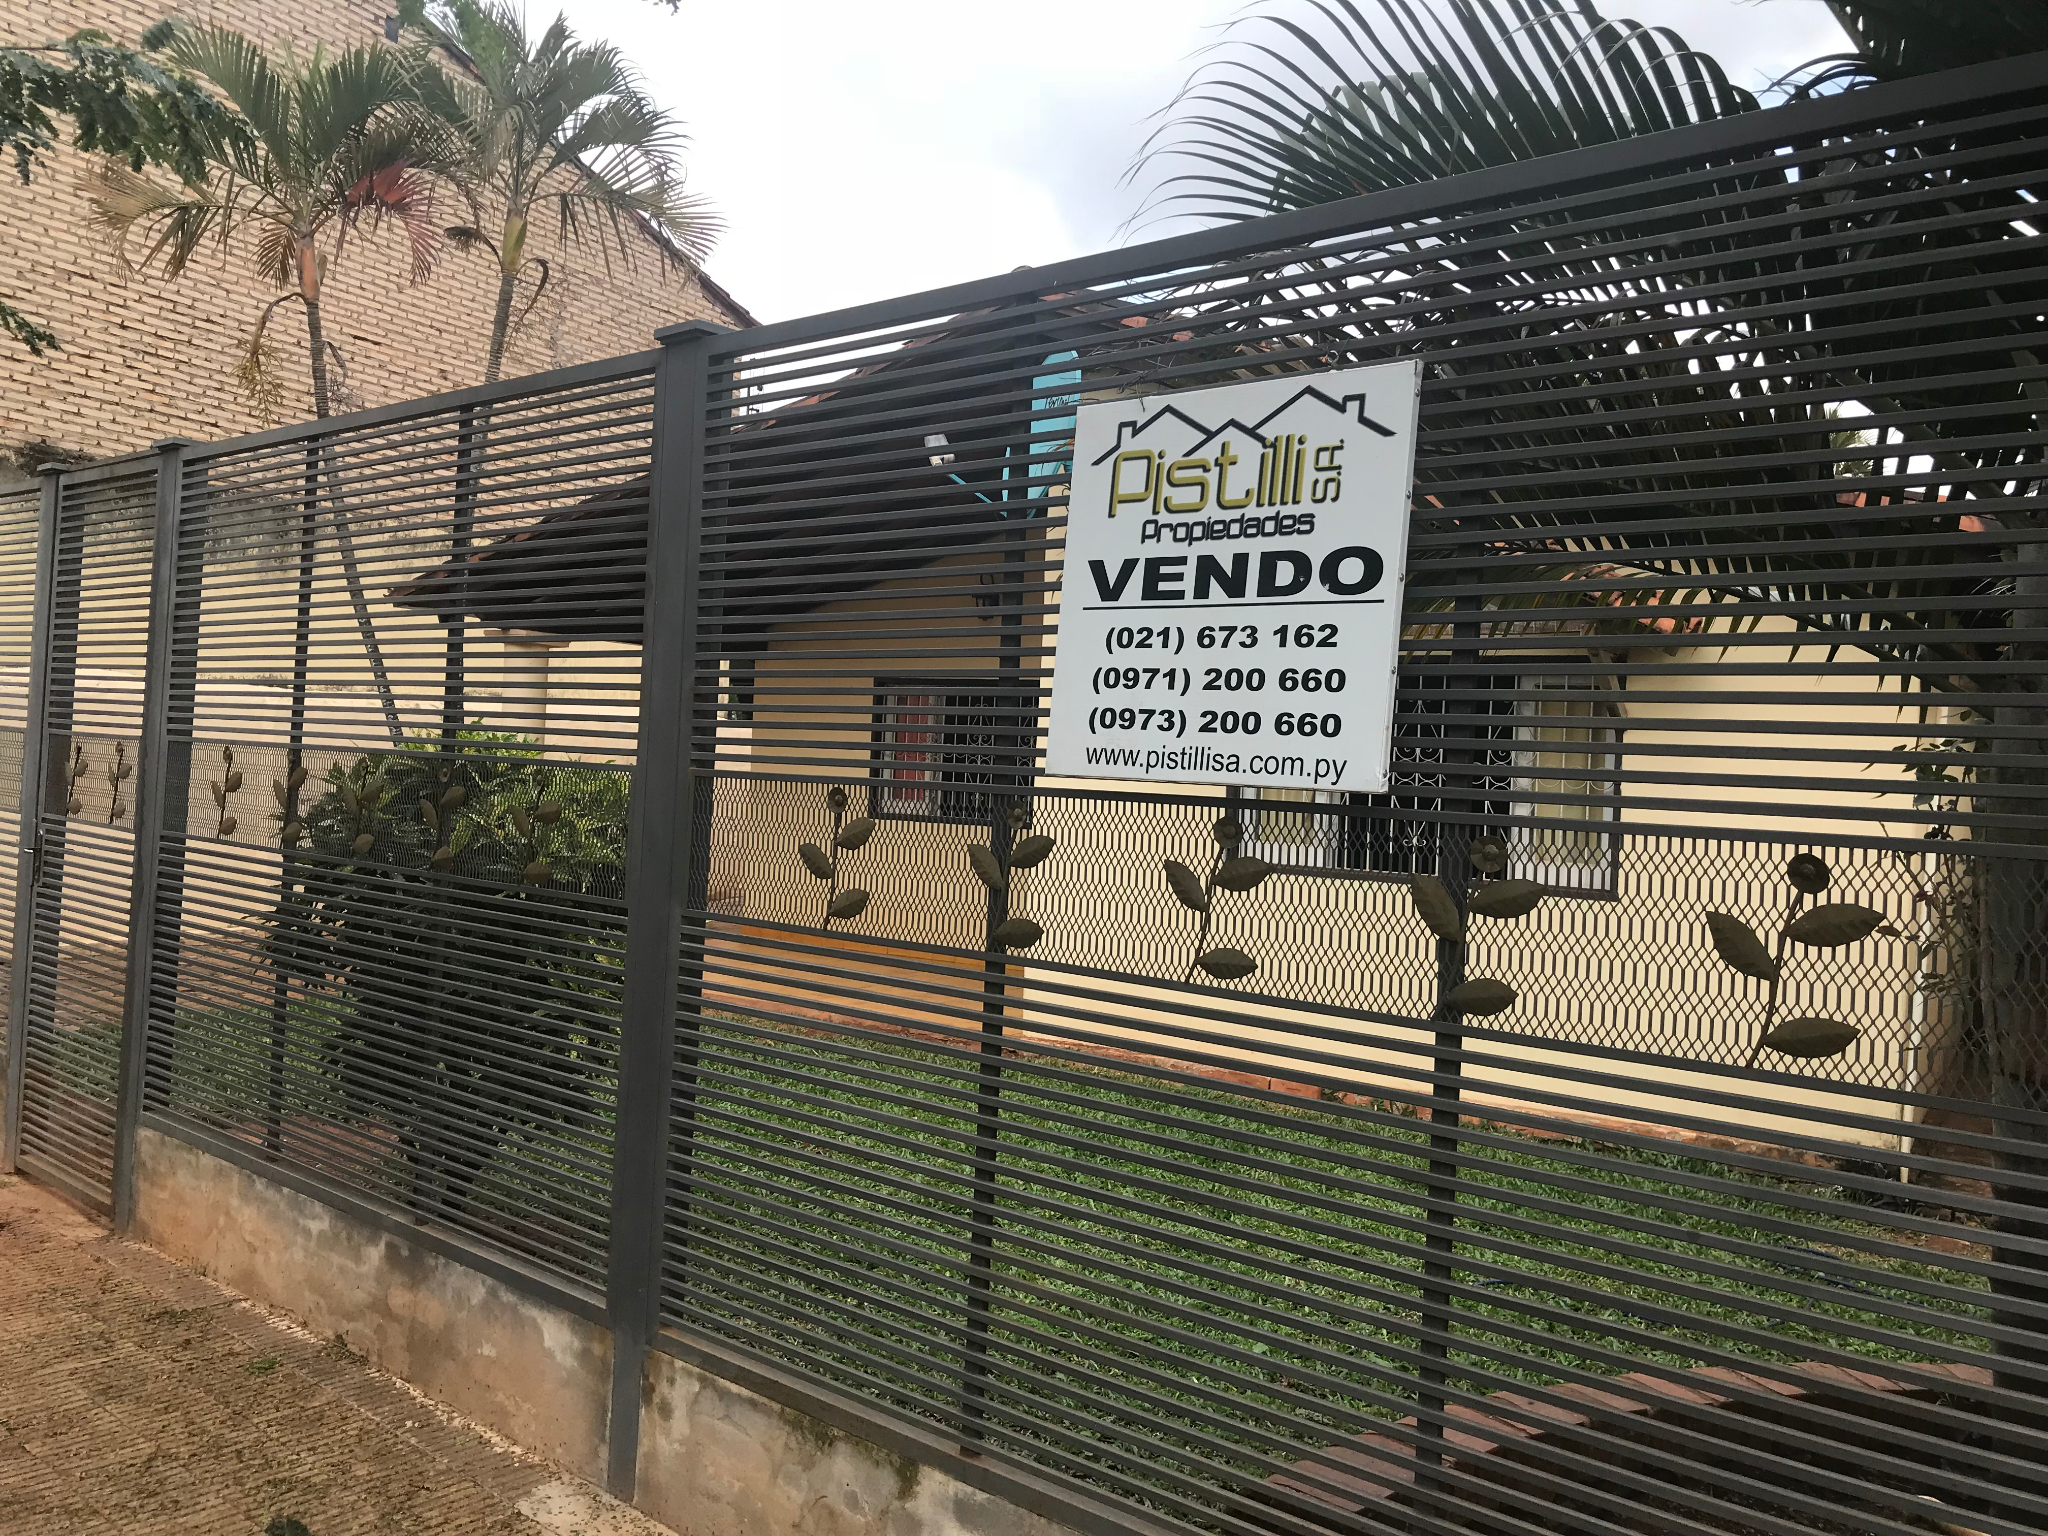 VENDO V-113 Hermosa Casa Laurelty San Lorenzo